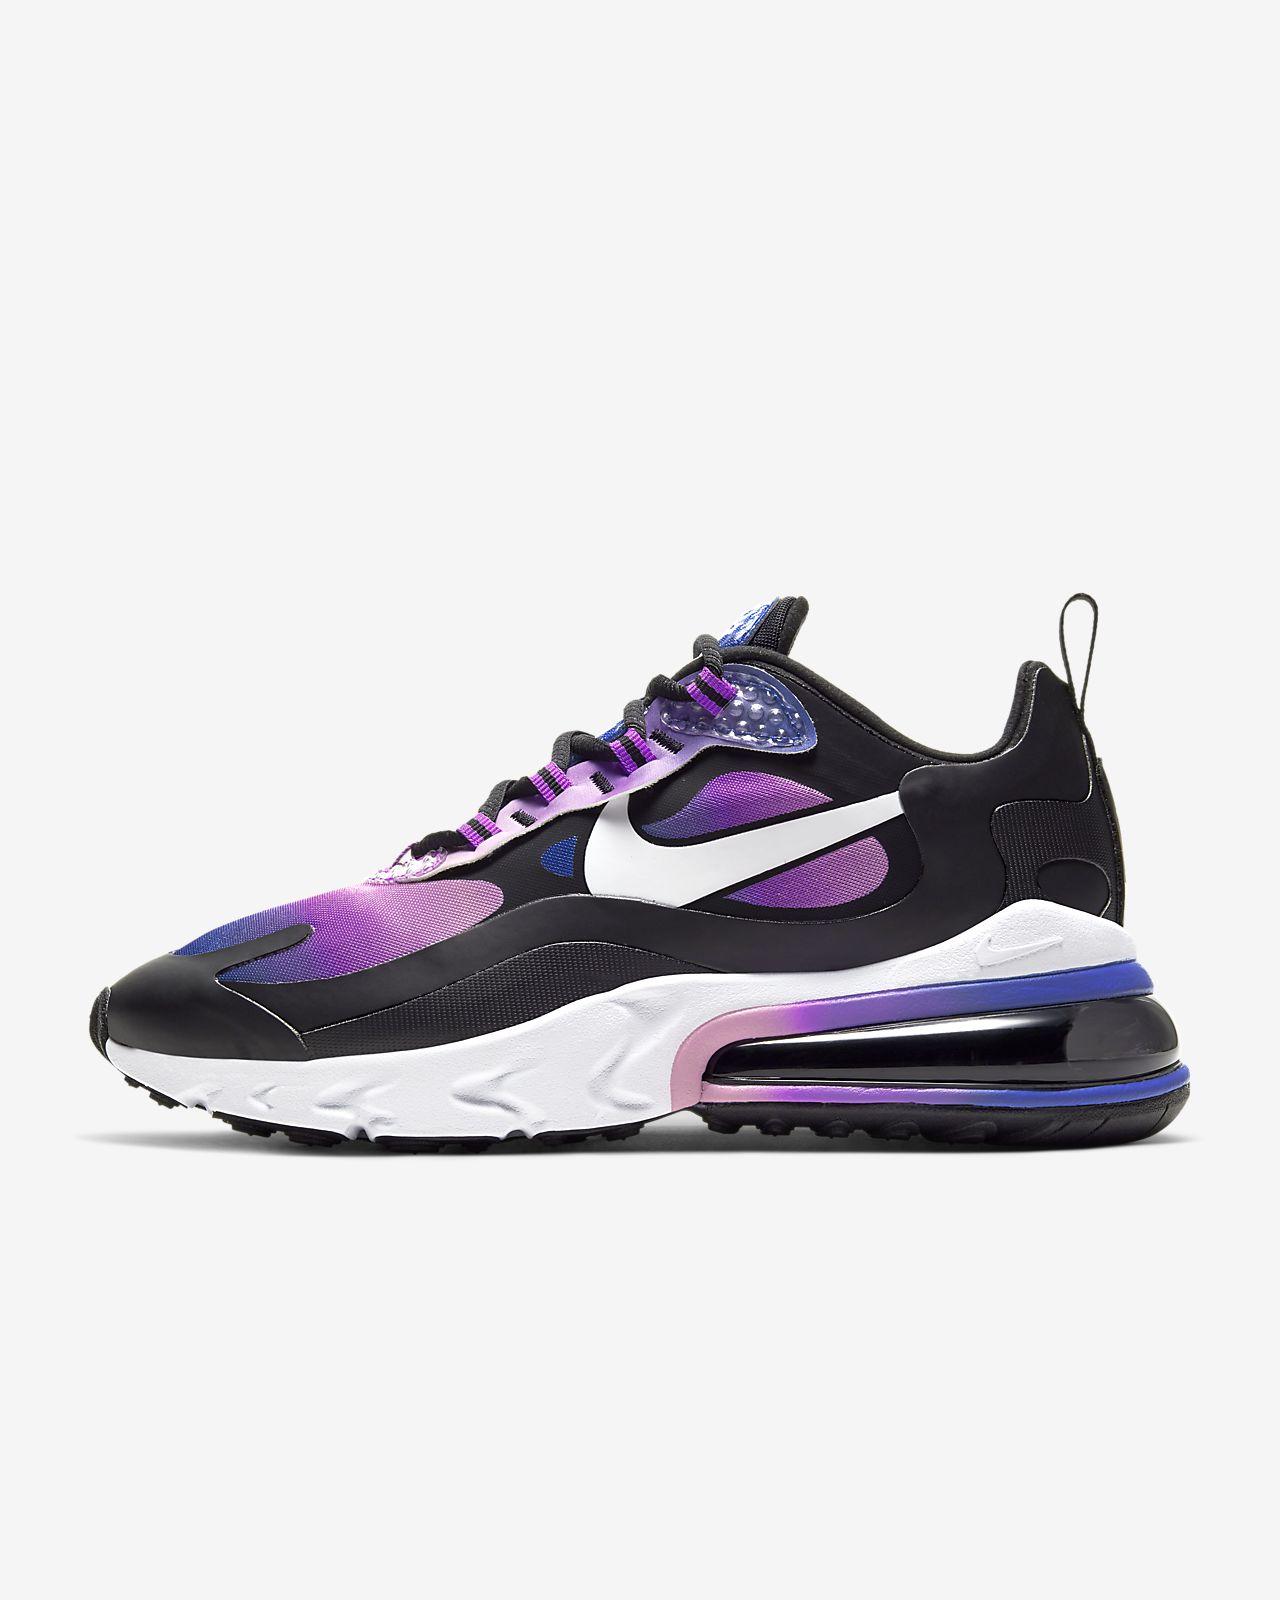 Nike Air Max 270 React SE sko til kvinder